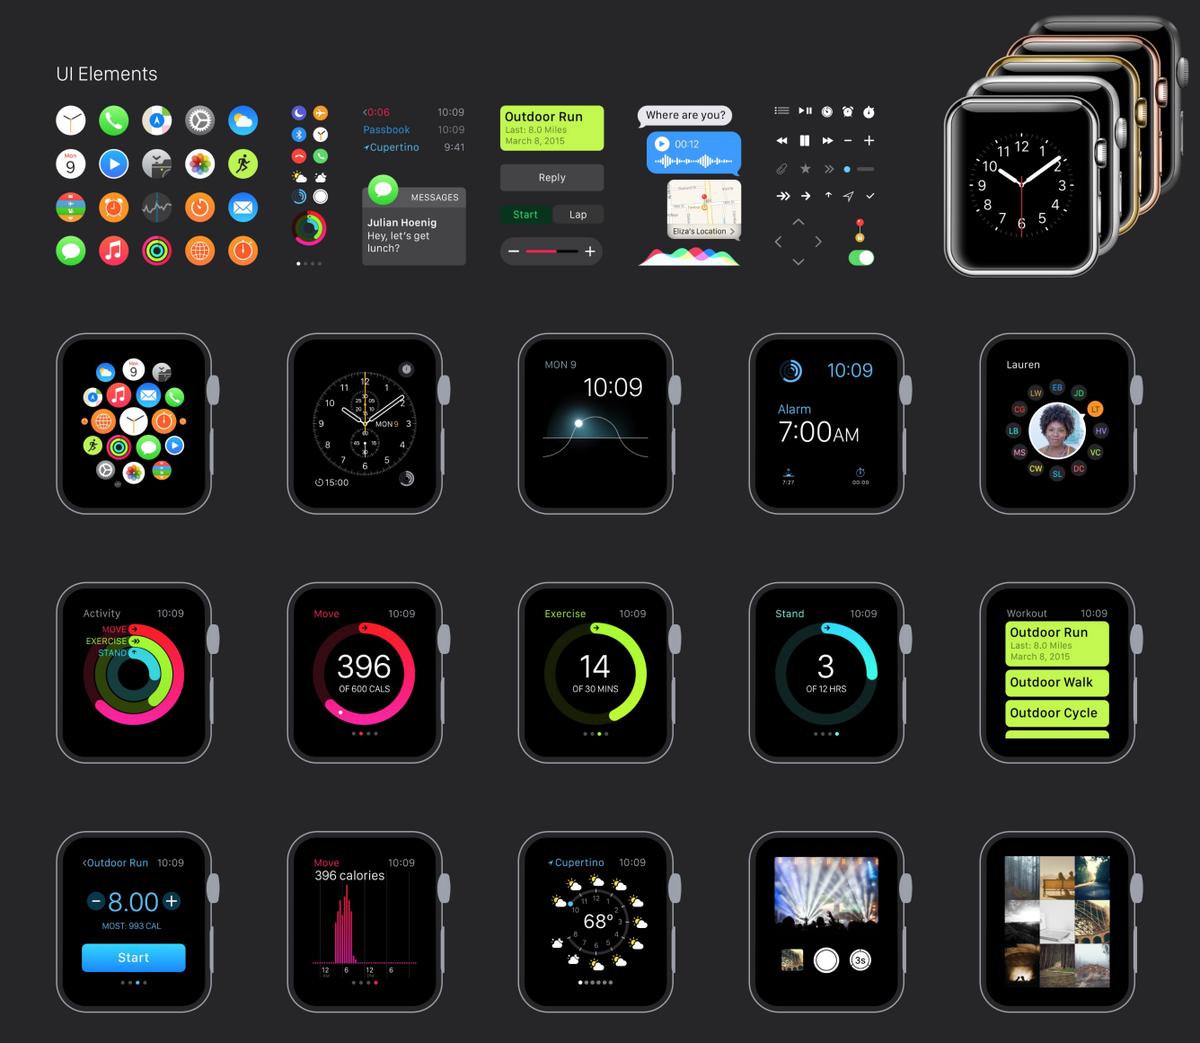 Apple Watch GUI for Sketch from @mengto https://t.co/1lN1o3GDD3 http://t.co/65KgC42da3